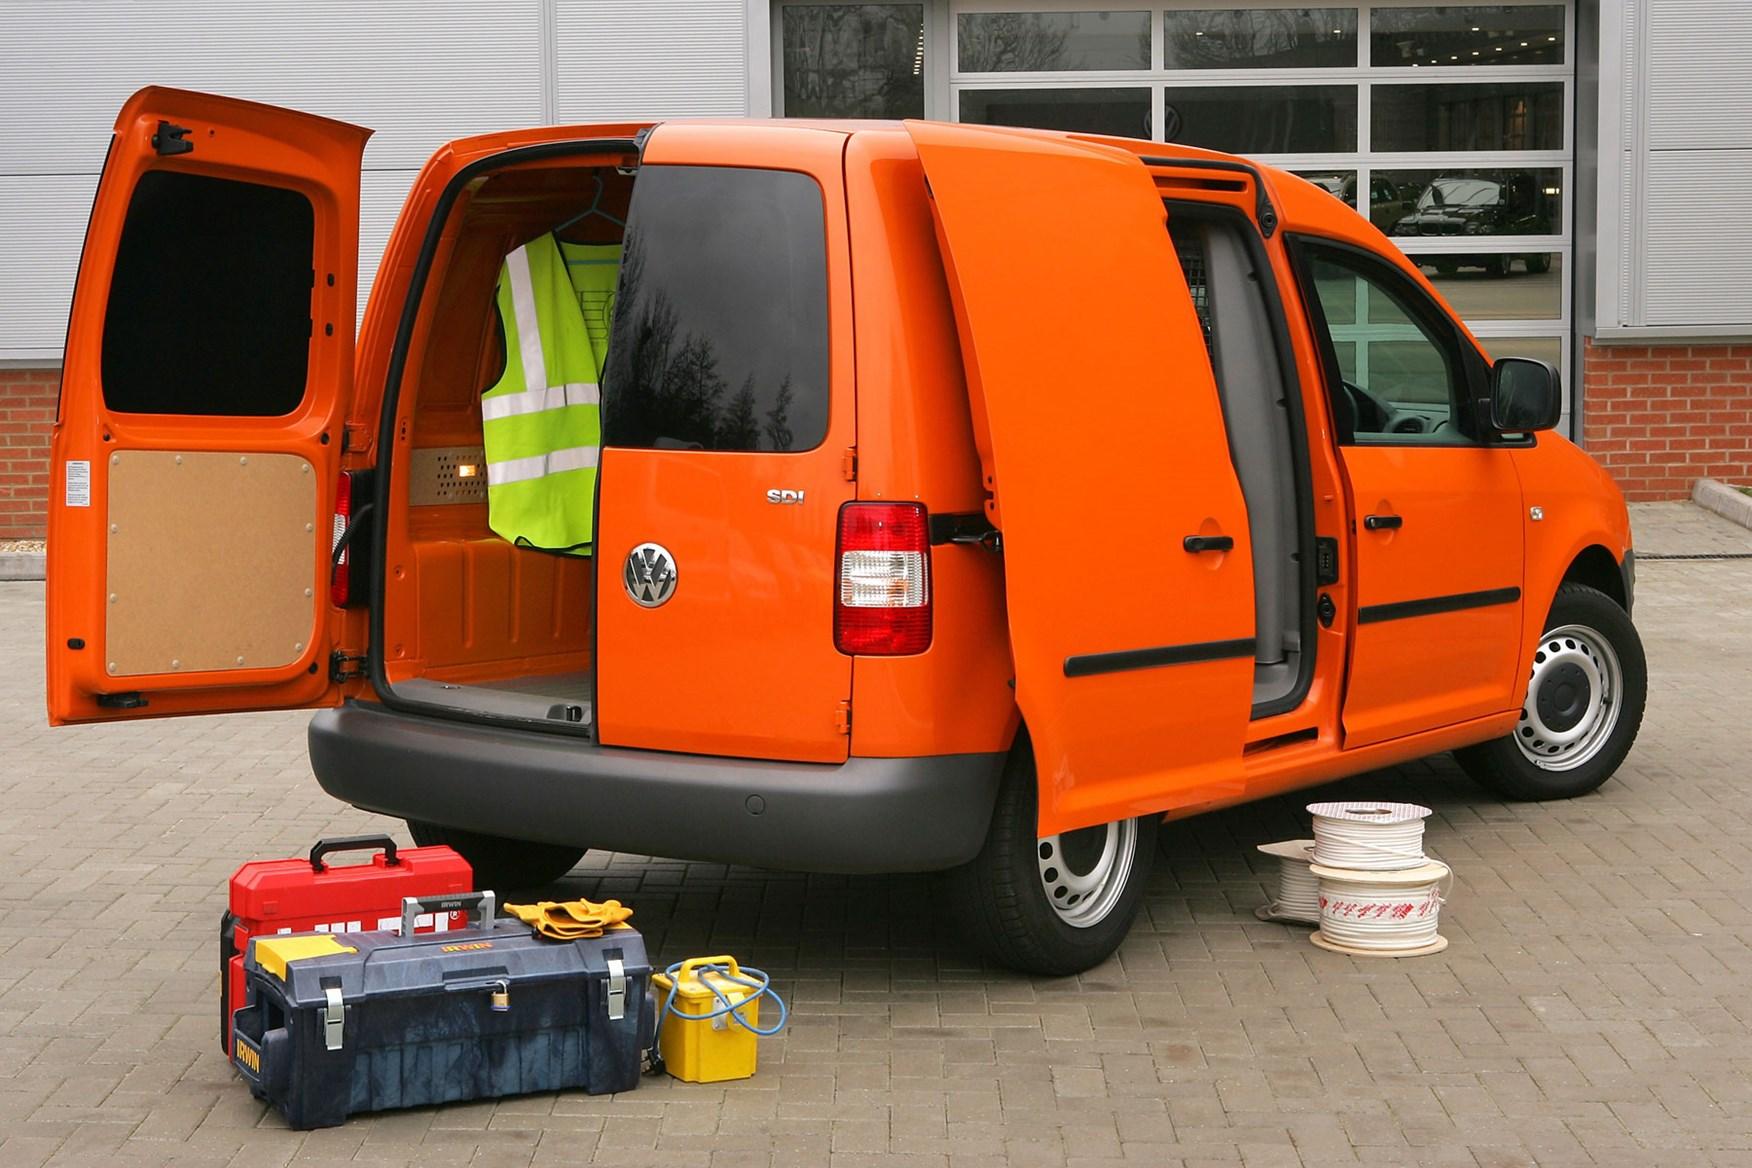 VW Caddy (2004-2010) rear view